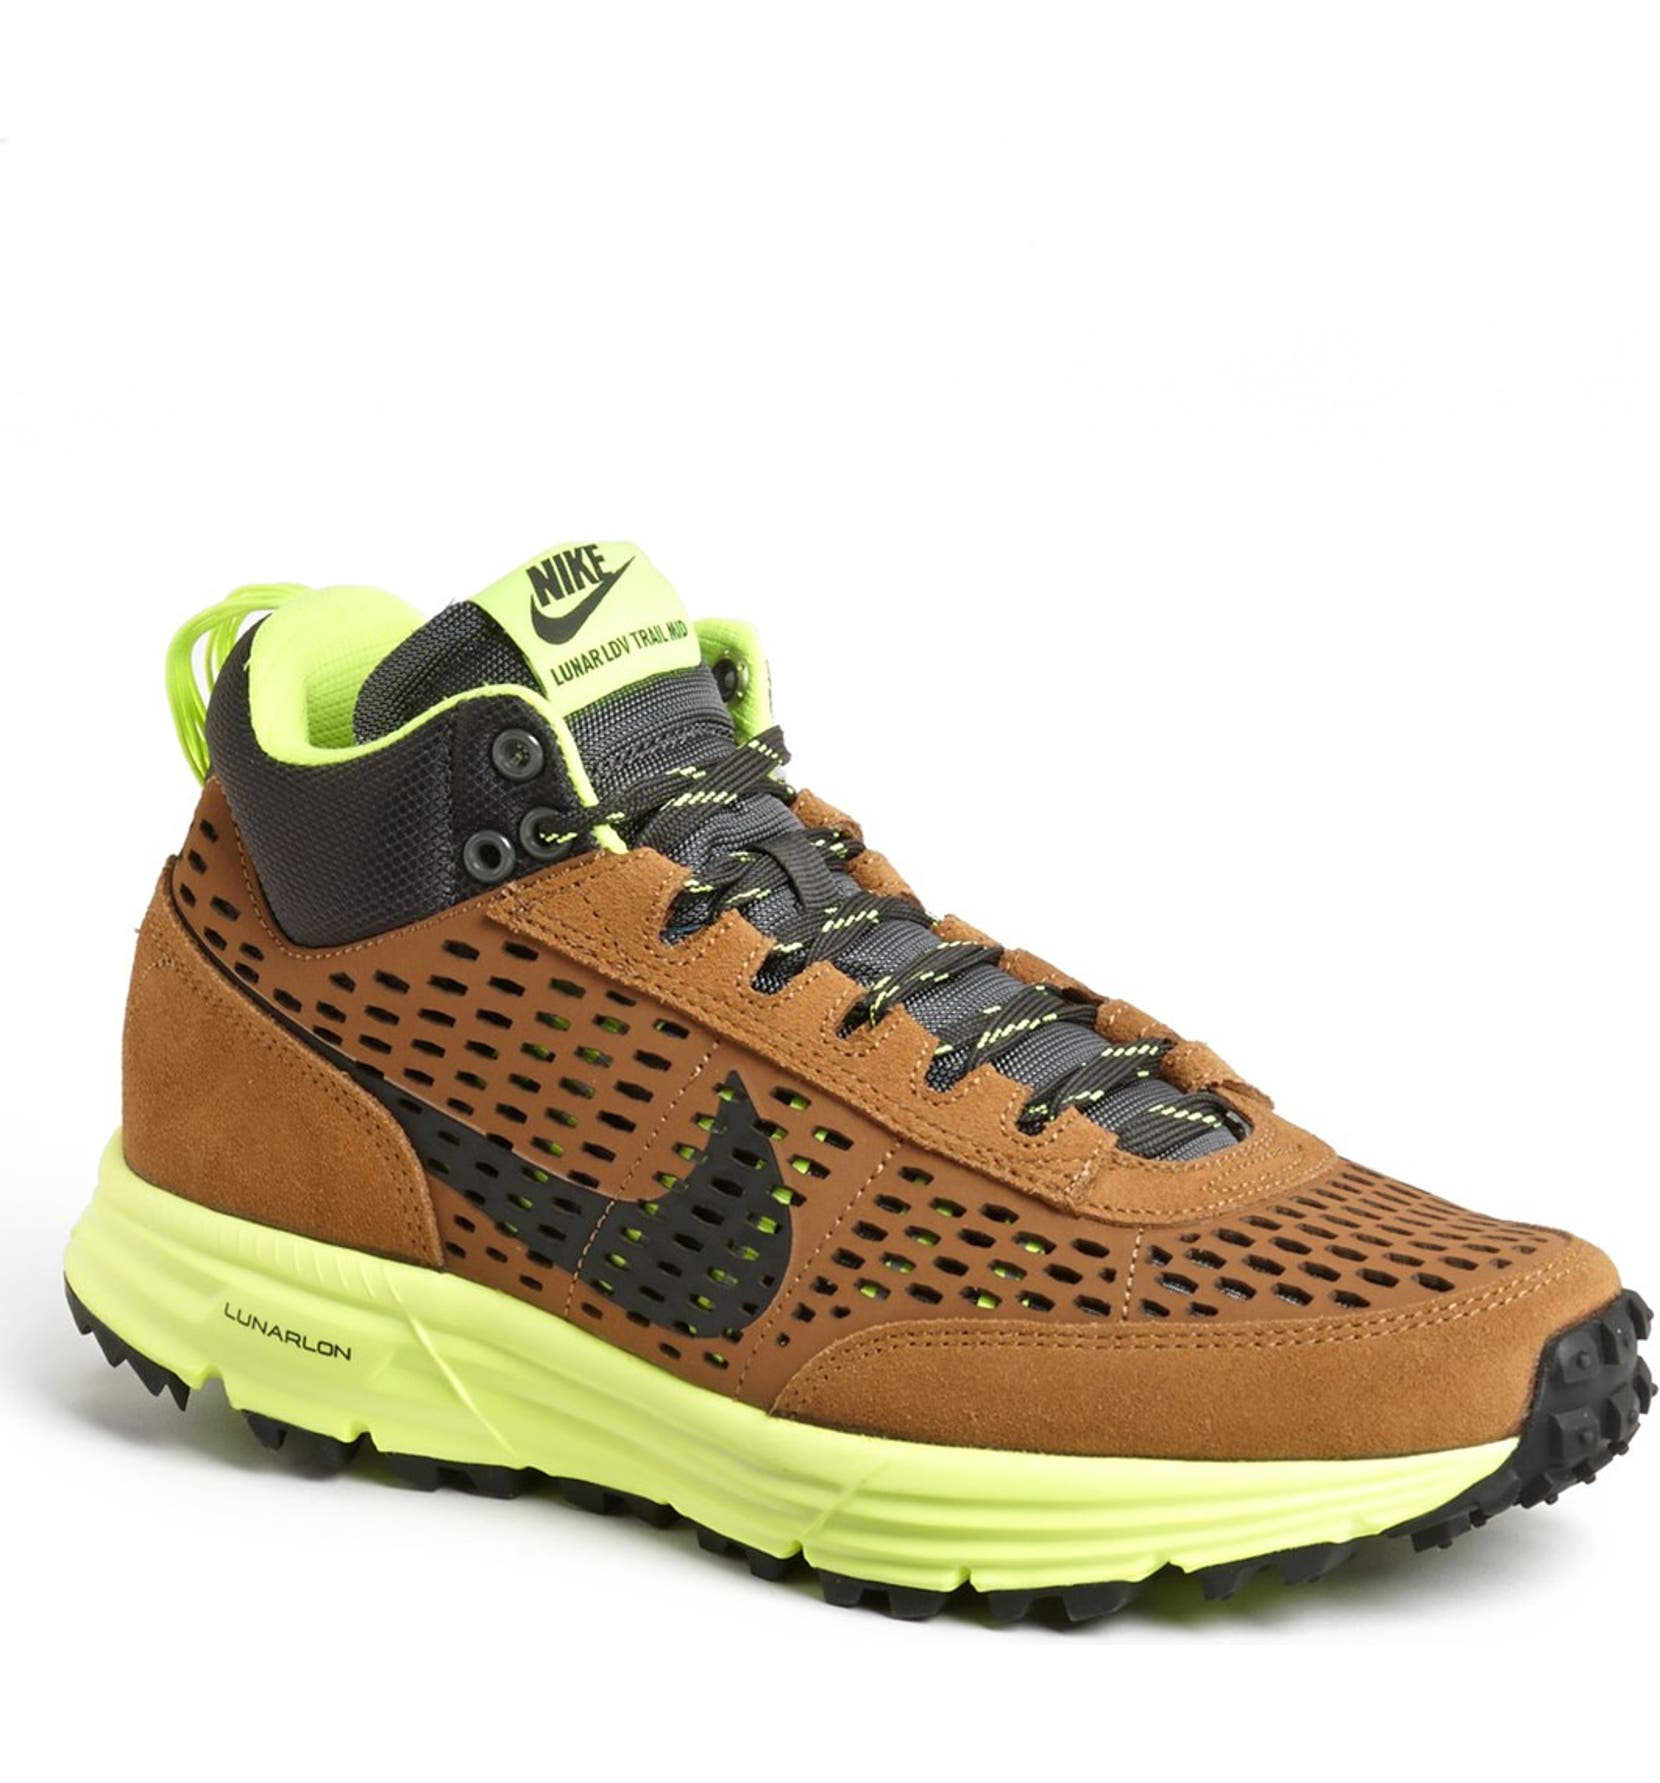 san francisco 35b0b fed53 Nike  Lunar LDV  Sneaker Boot (Men)   Nordstrom